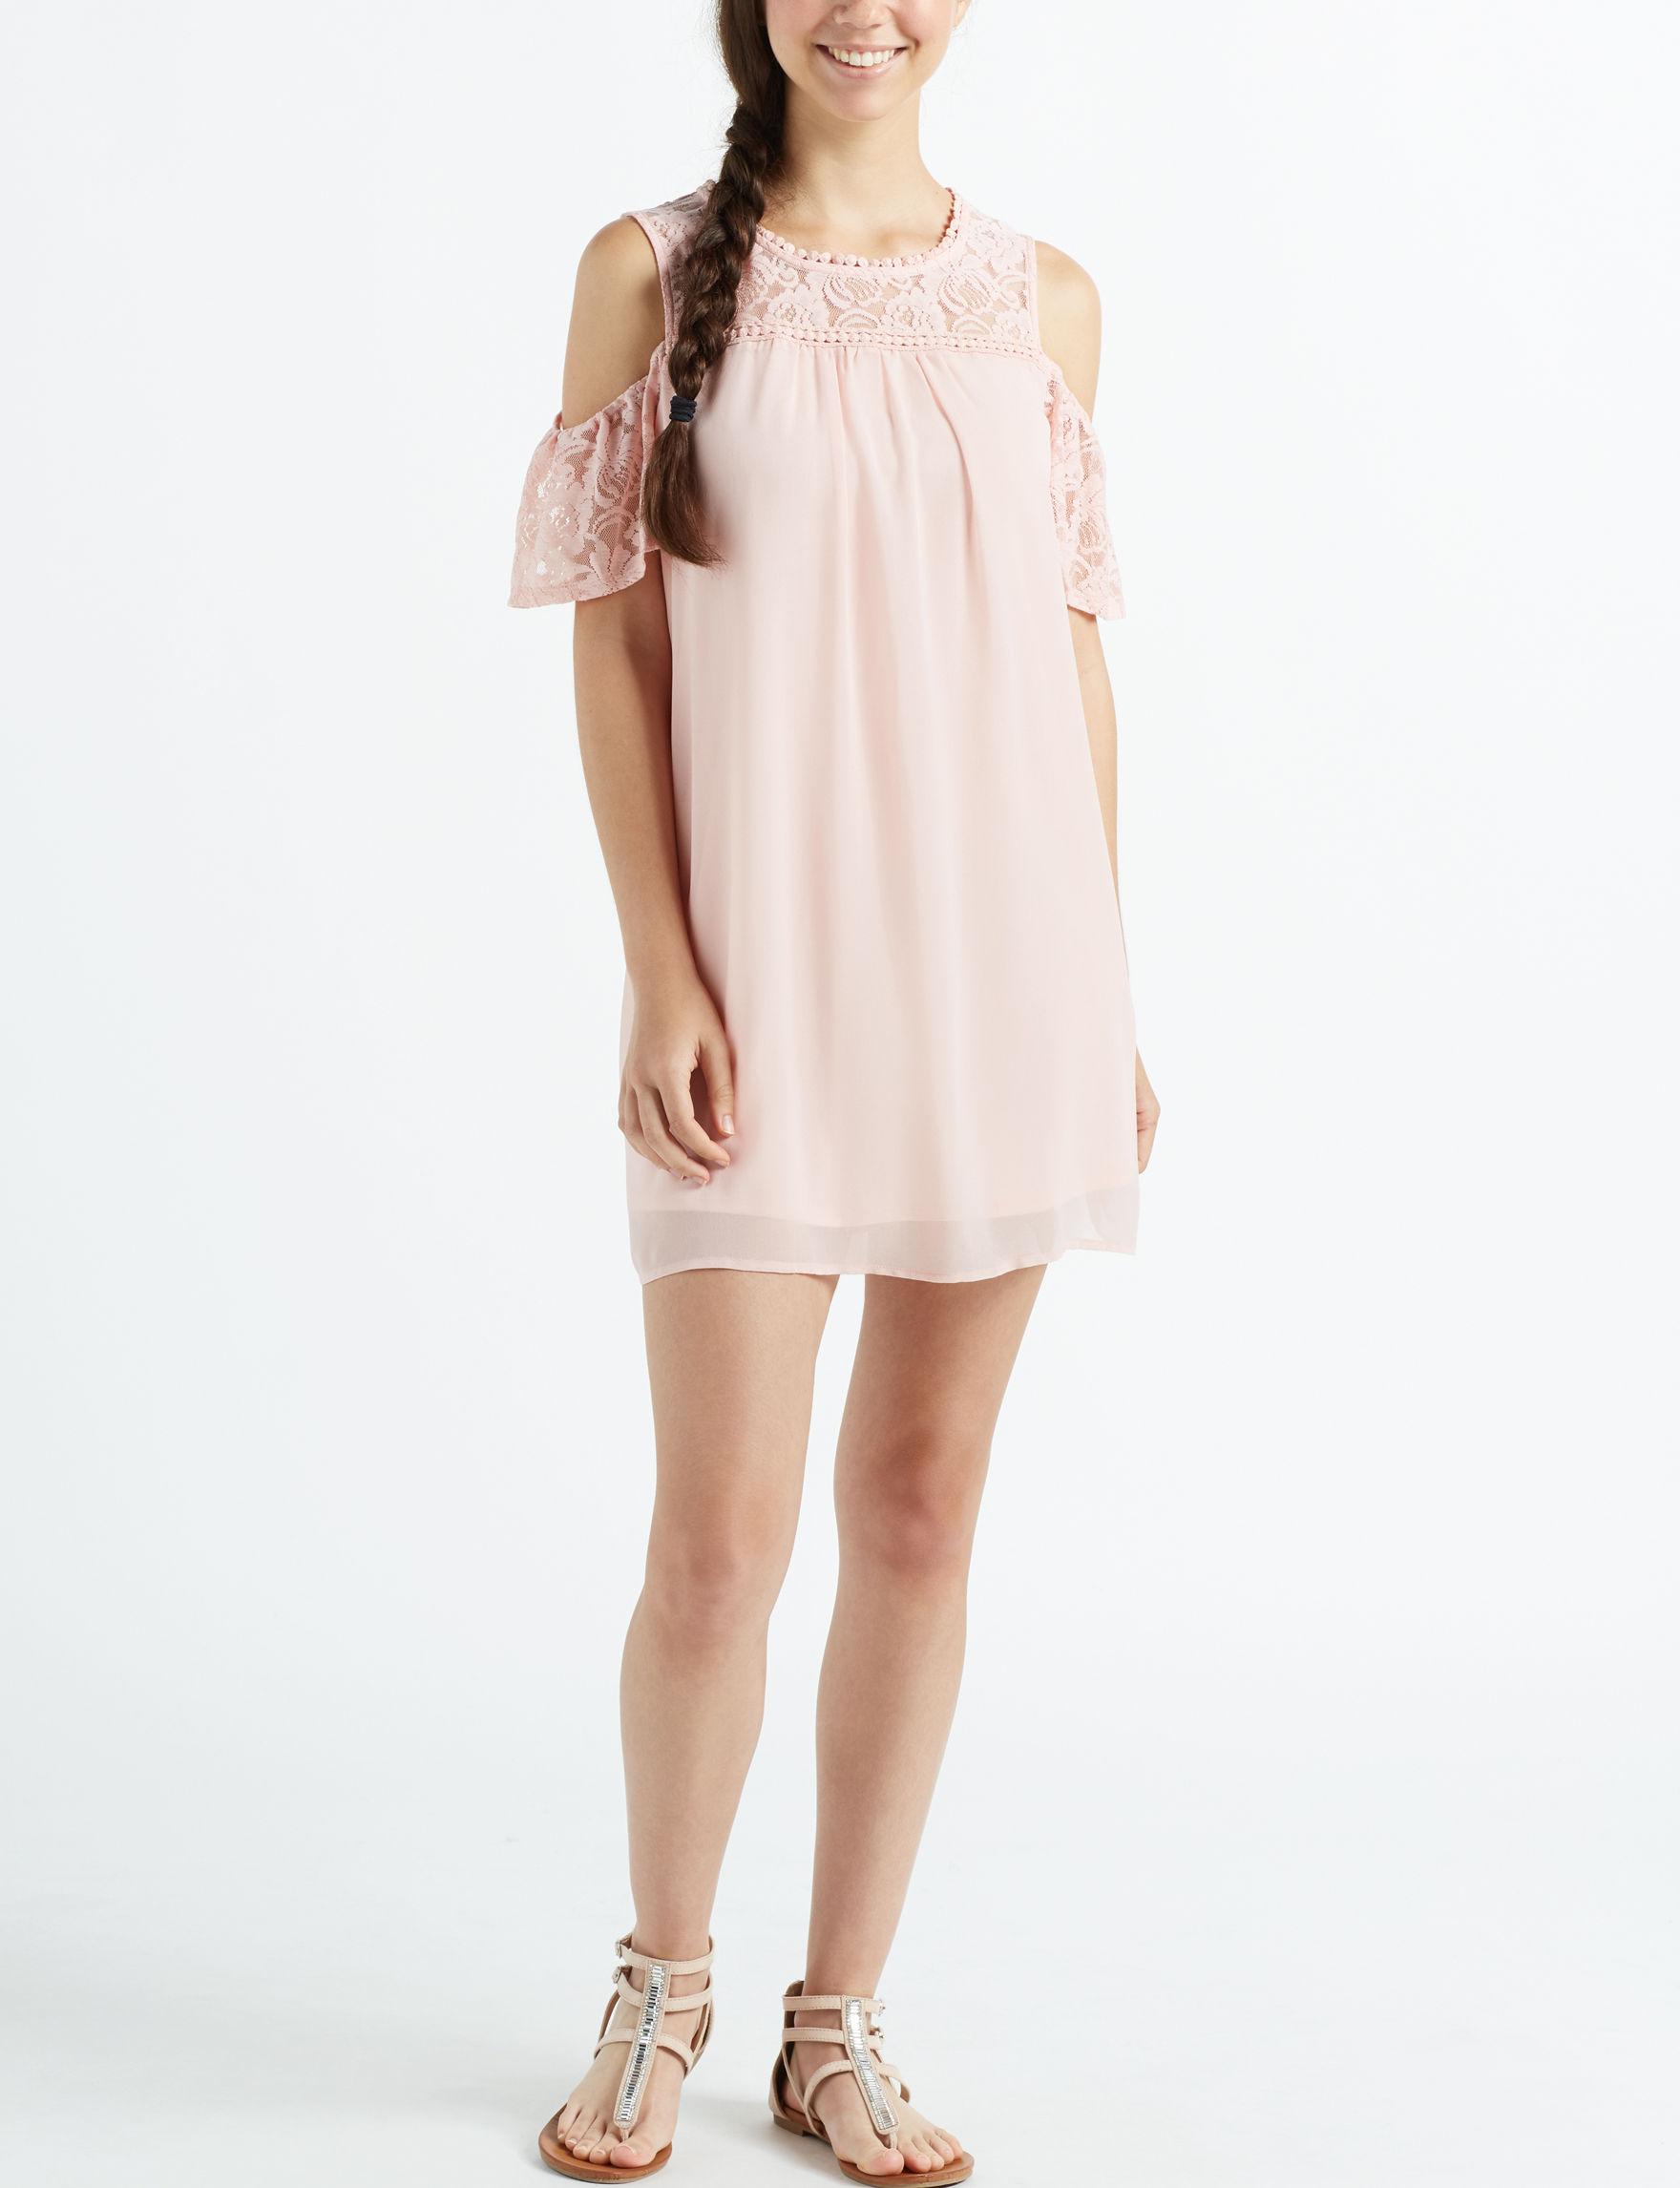 As U Wish Blush Everyday & Casual Shift Dresses